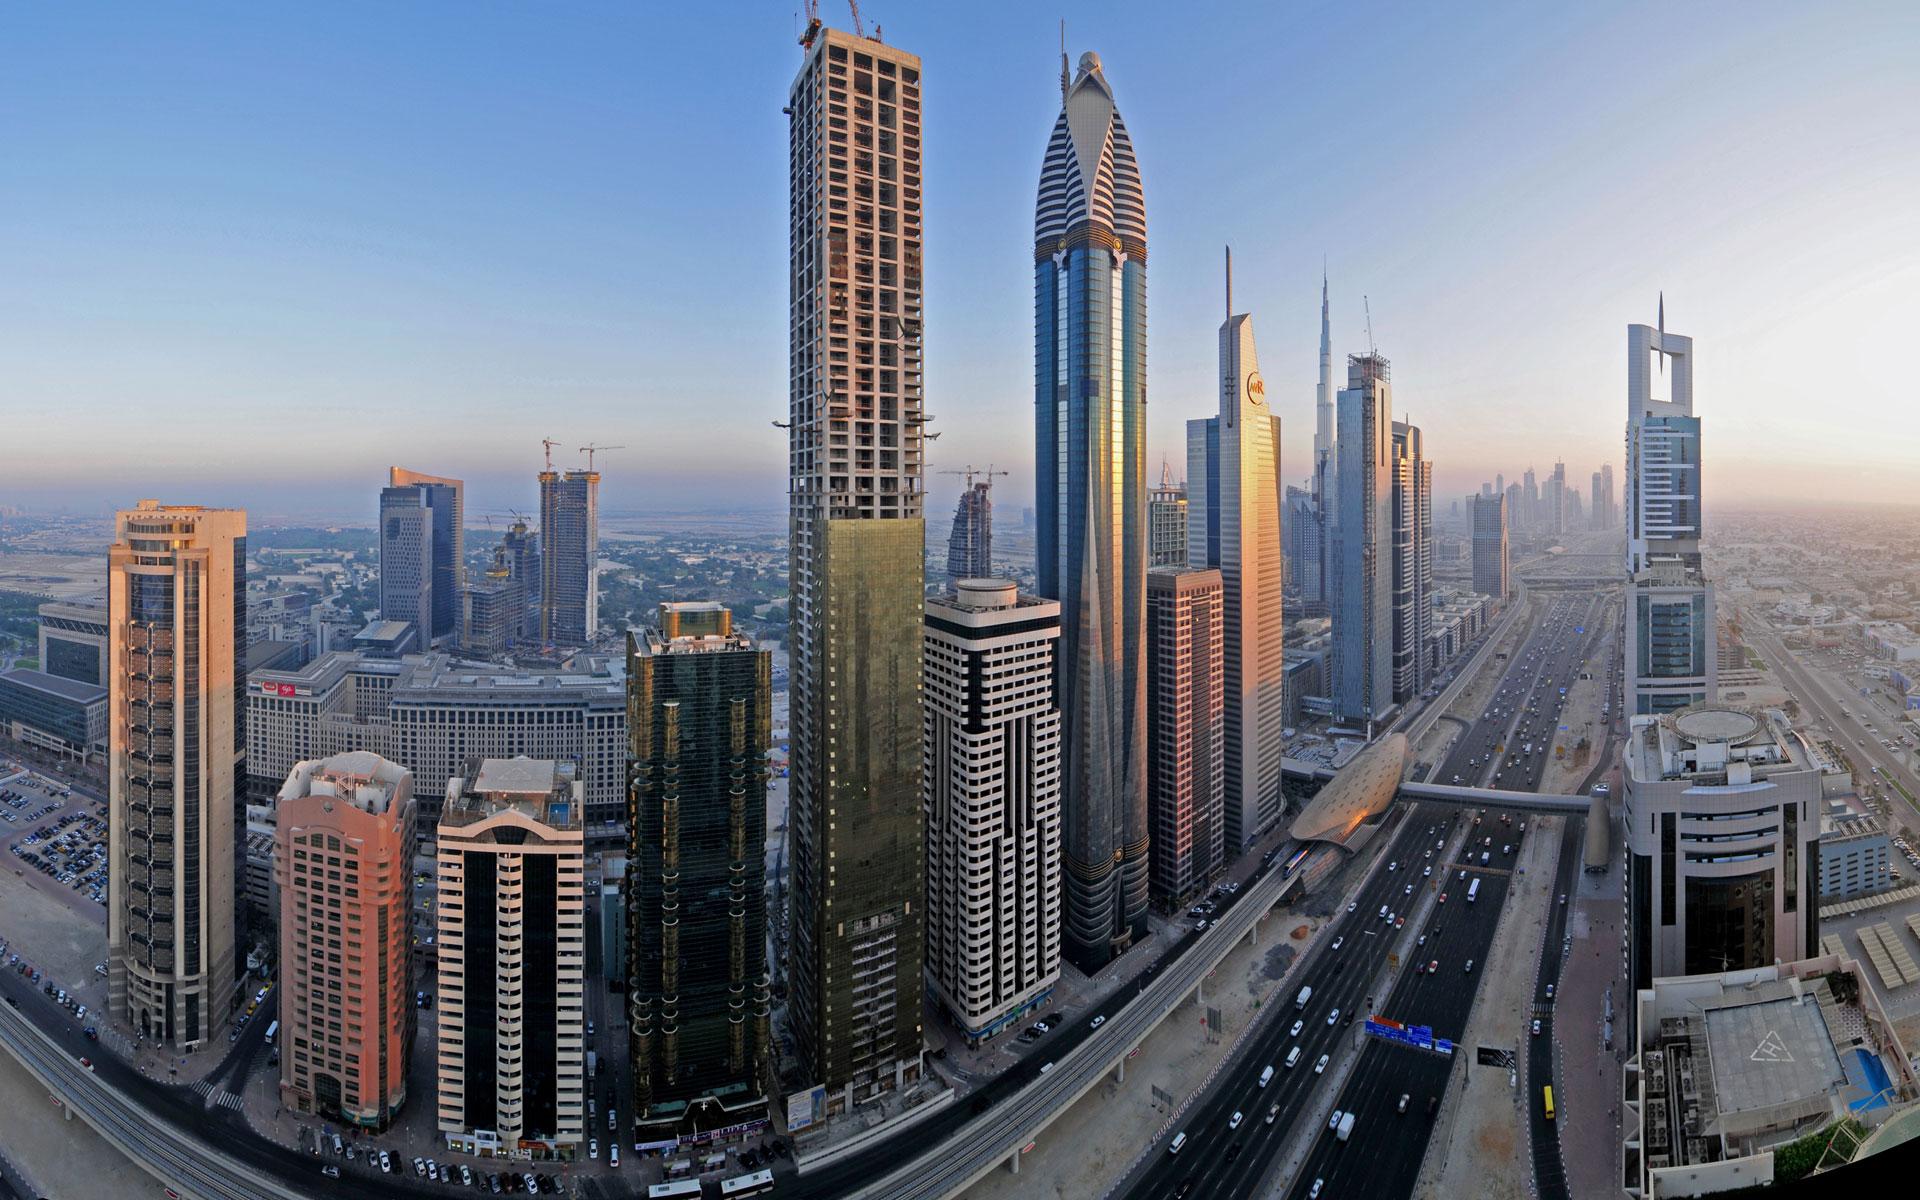 Downtown Dubai Widescreen wallpaper